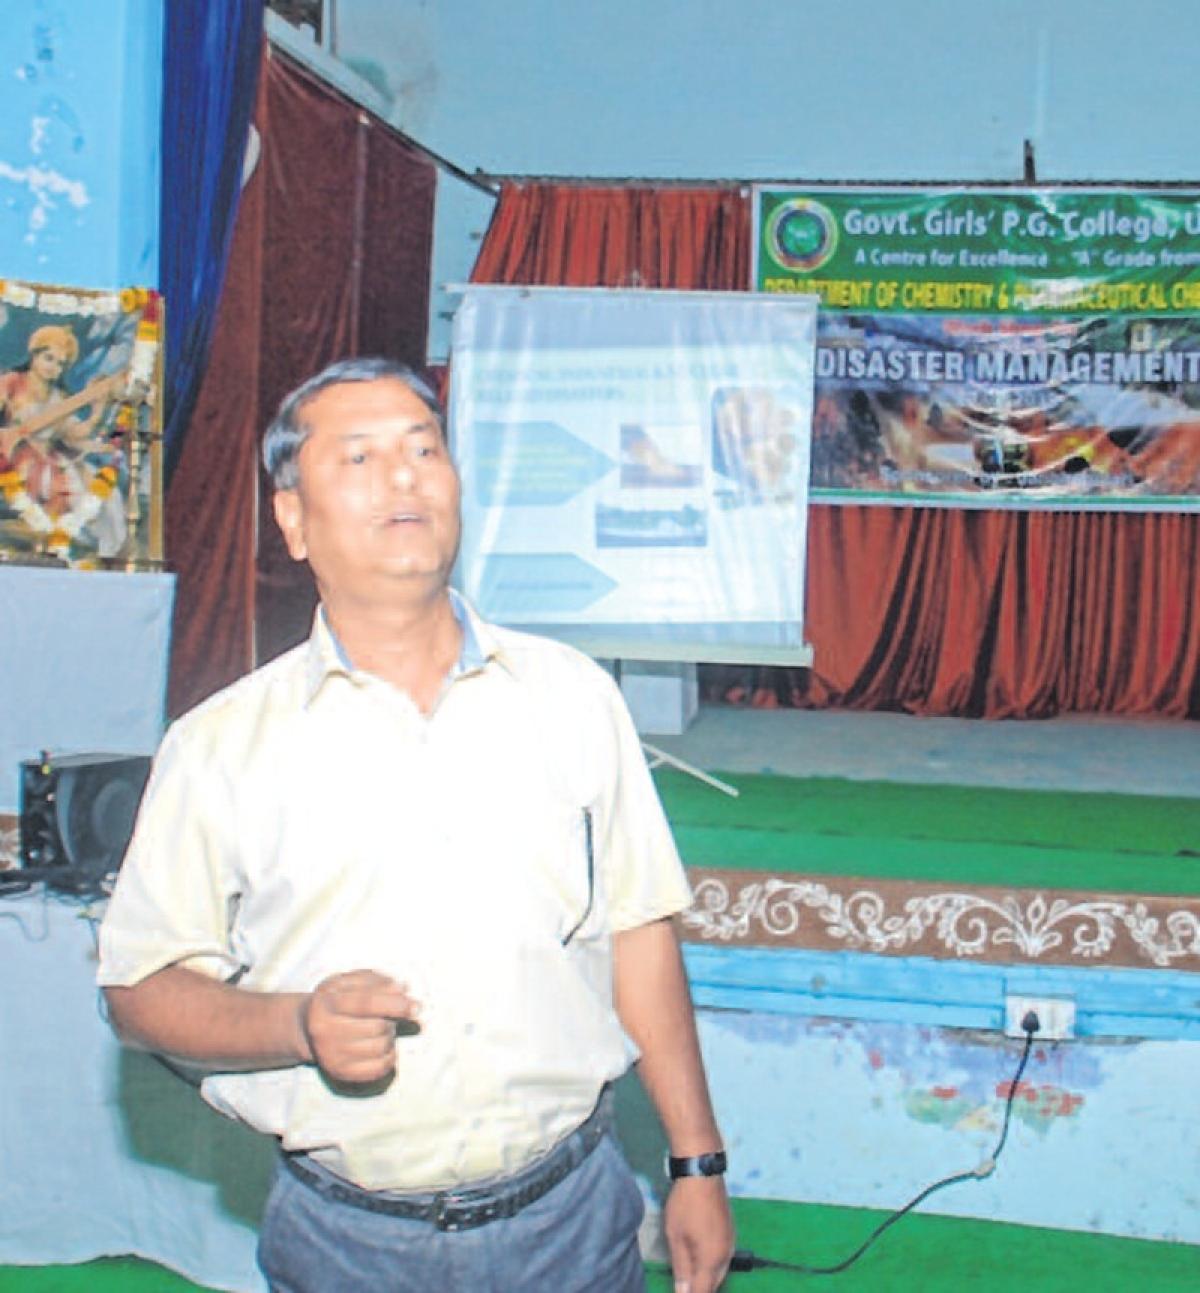 Ujjain: Workshop on chemical mishap organised